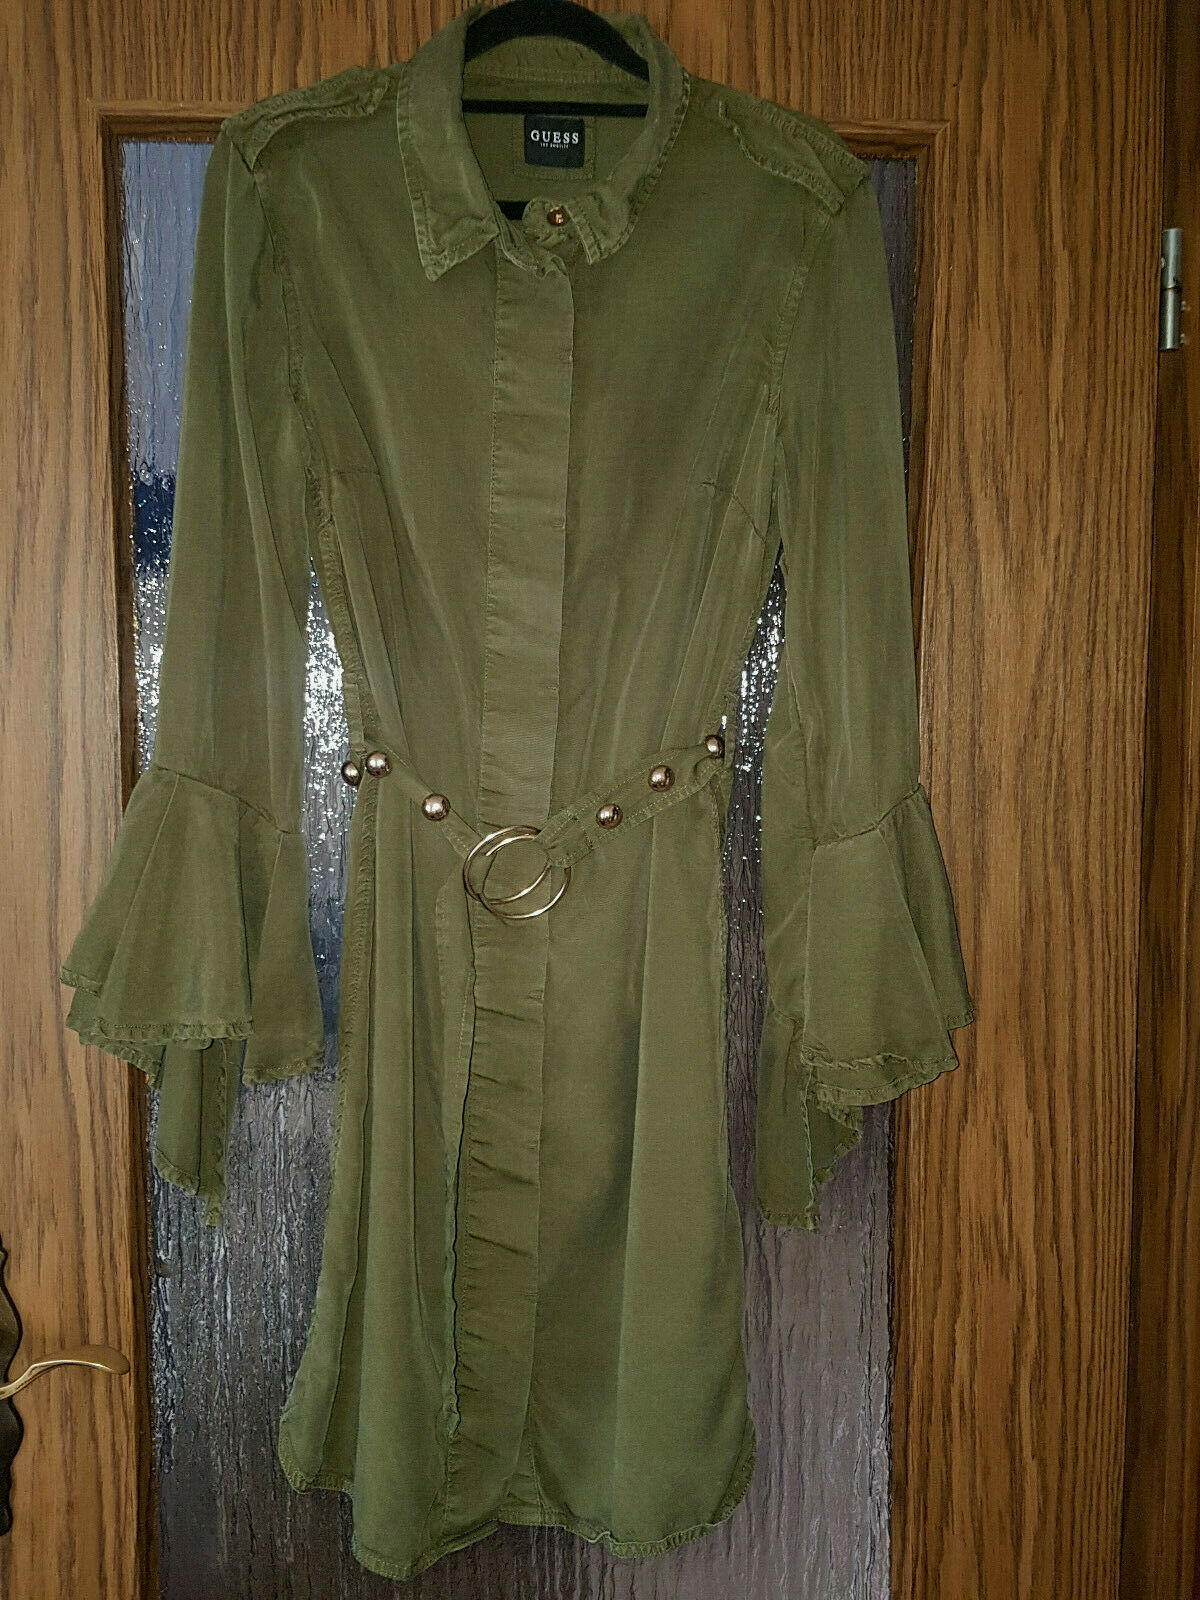 Guess Los Angeles Kleid Armeekleid Hemdkleid Gr. 36 S khaki, oliv grün gelbGold